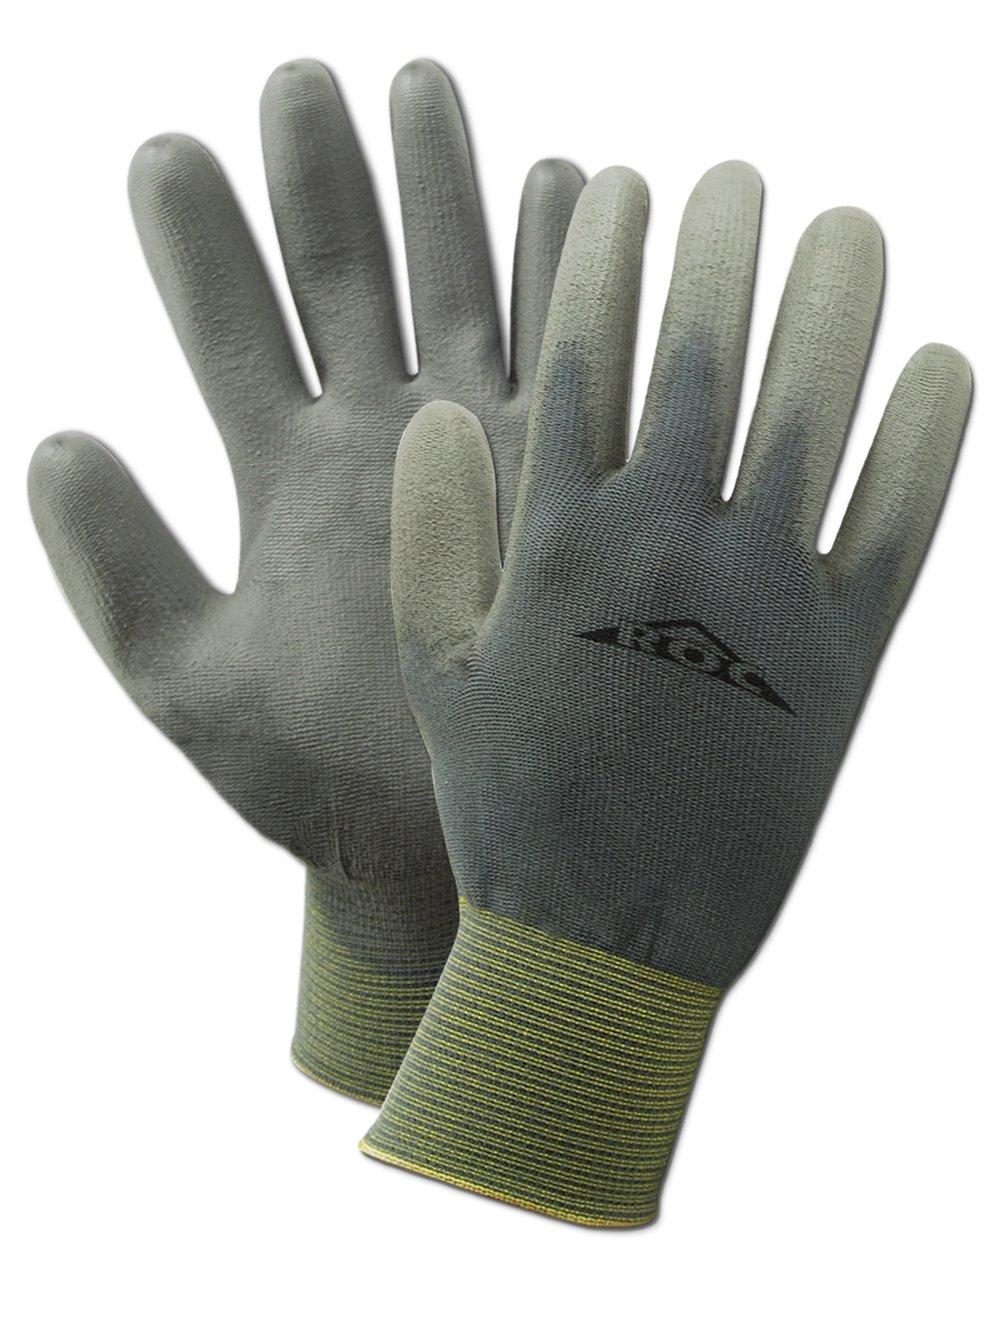 "MAGID ROC GP150 Nylon Glove, Polyurethane Palm Coating, Knit Wrist Cuff, 9.5"" Length, Size 8  (12 Pair)"